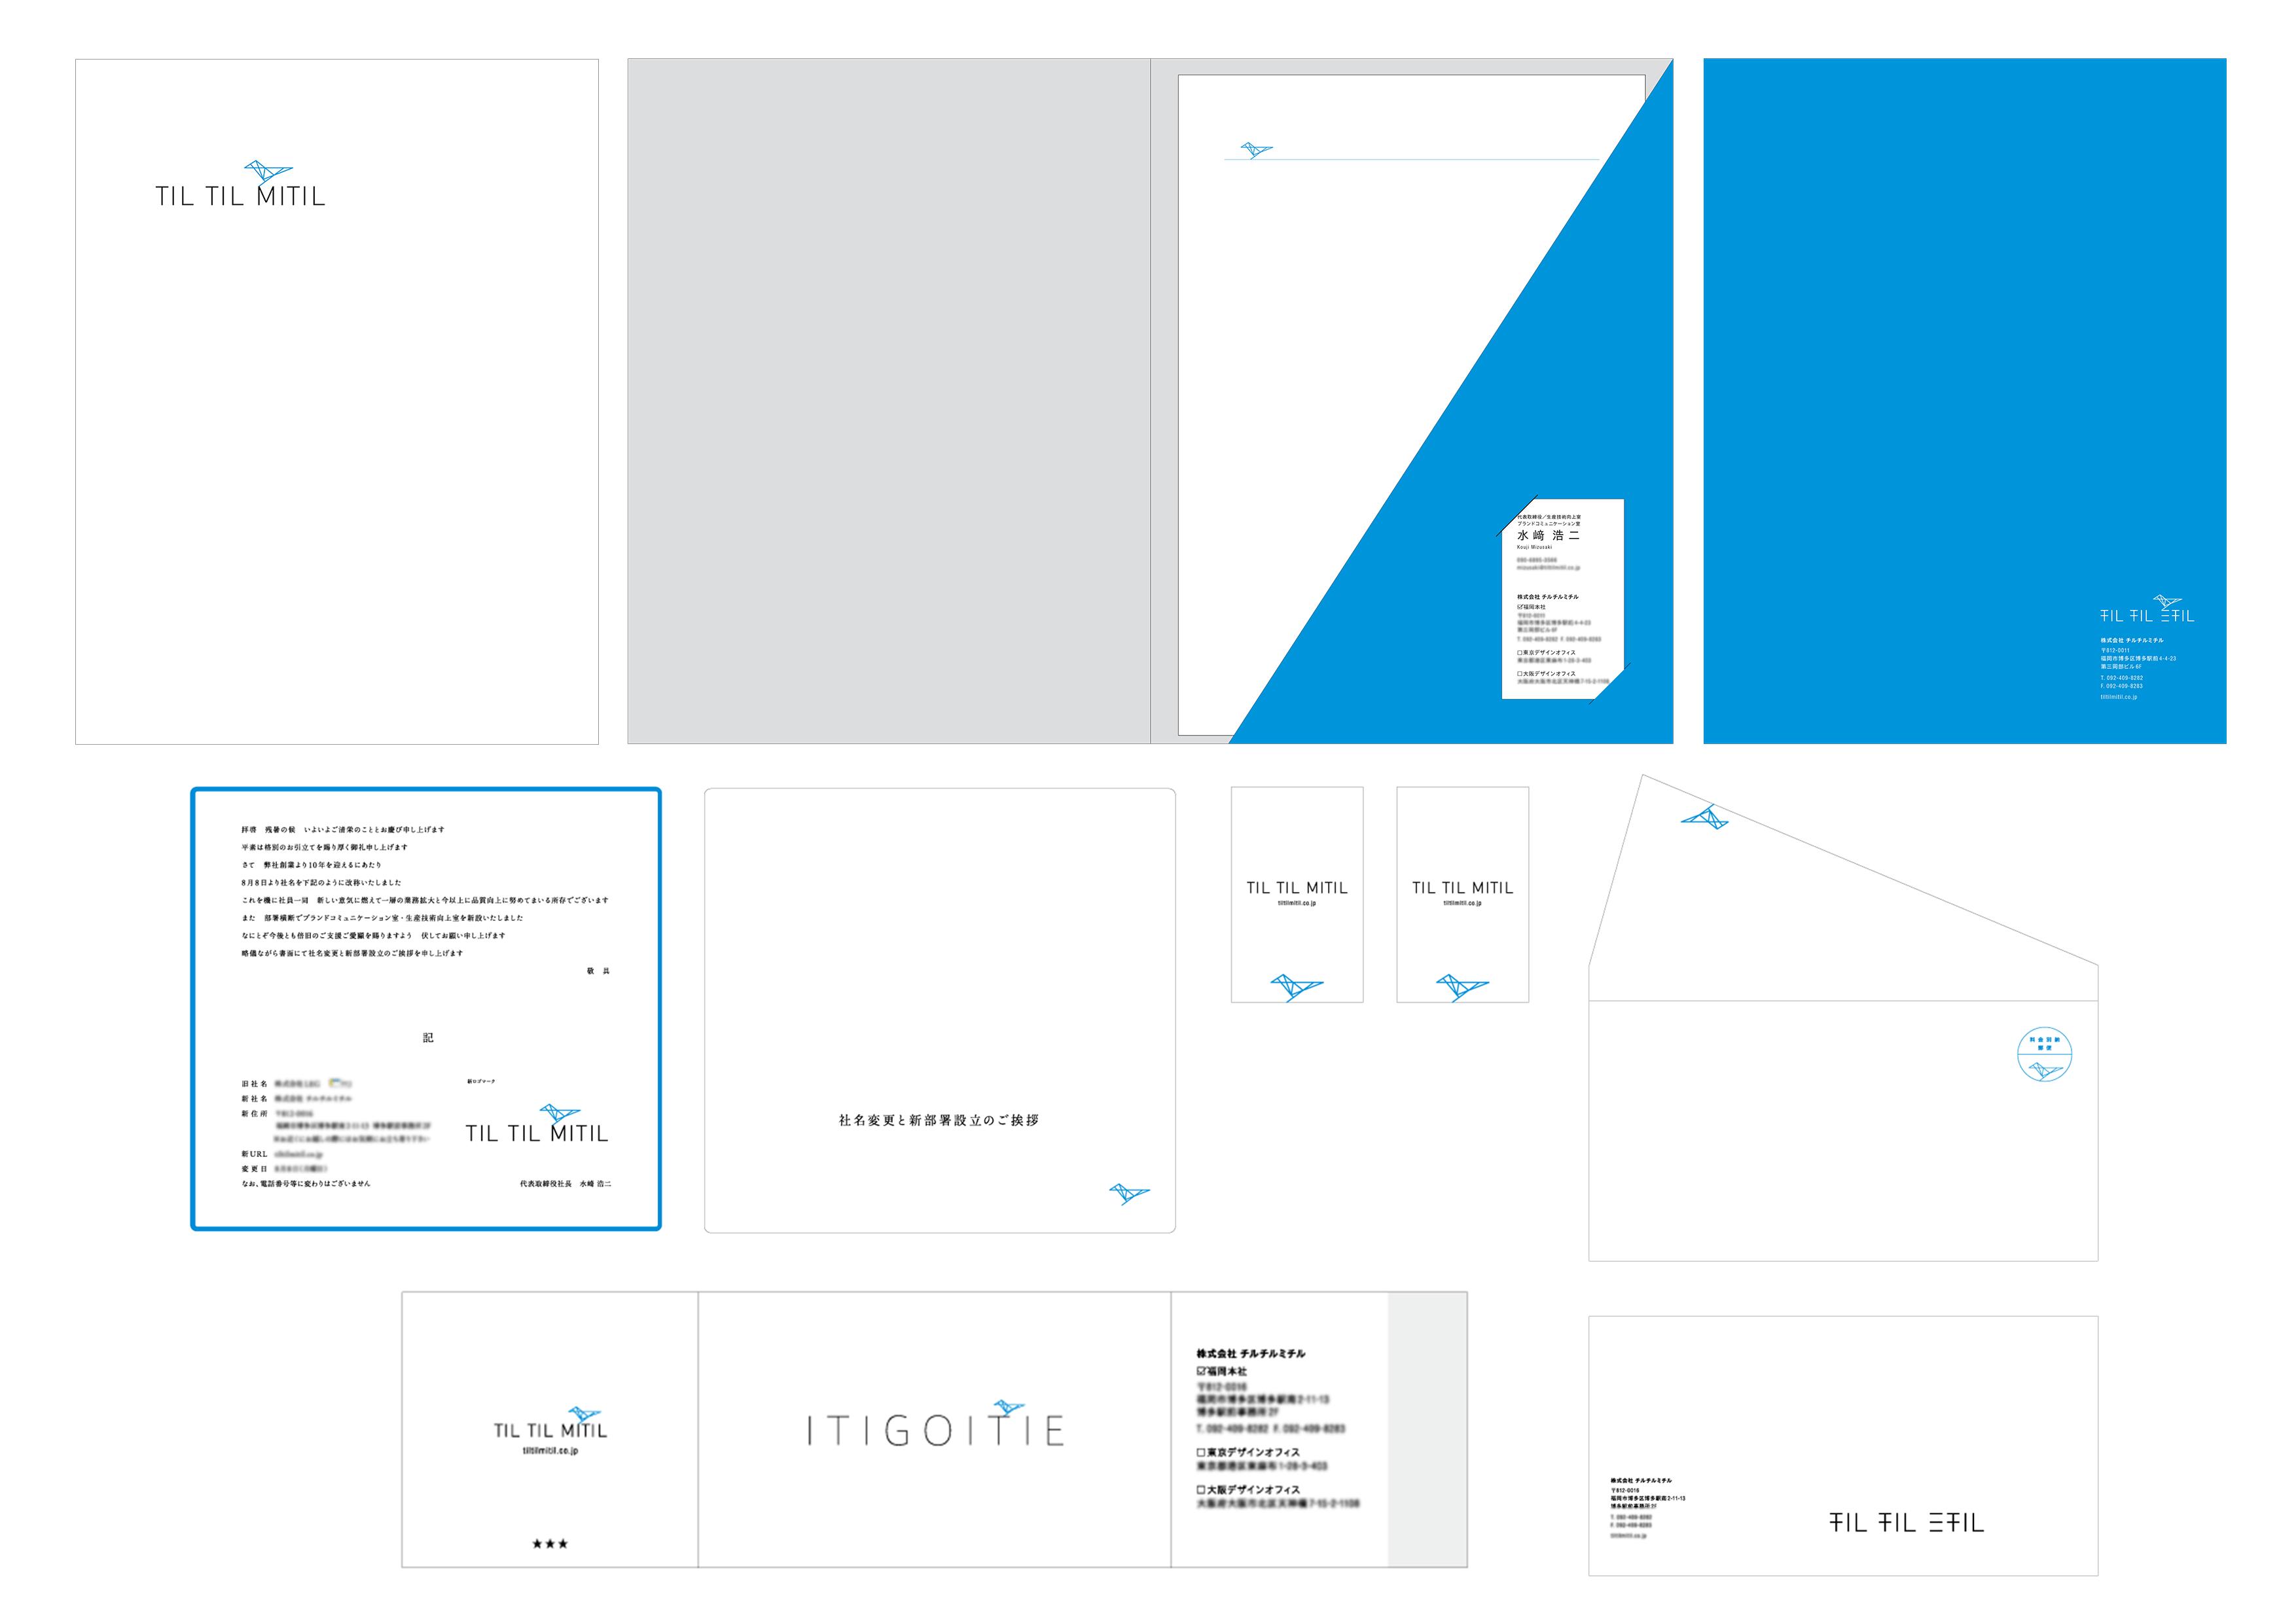 leg_tool_data_blue (1)